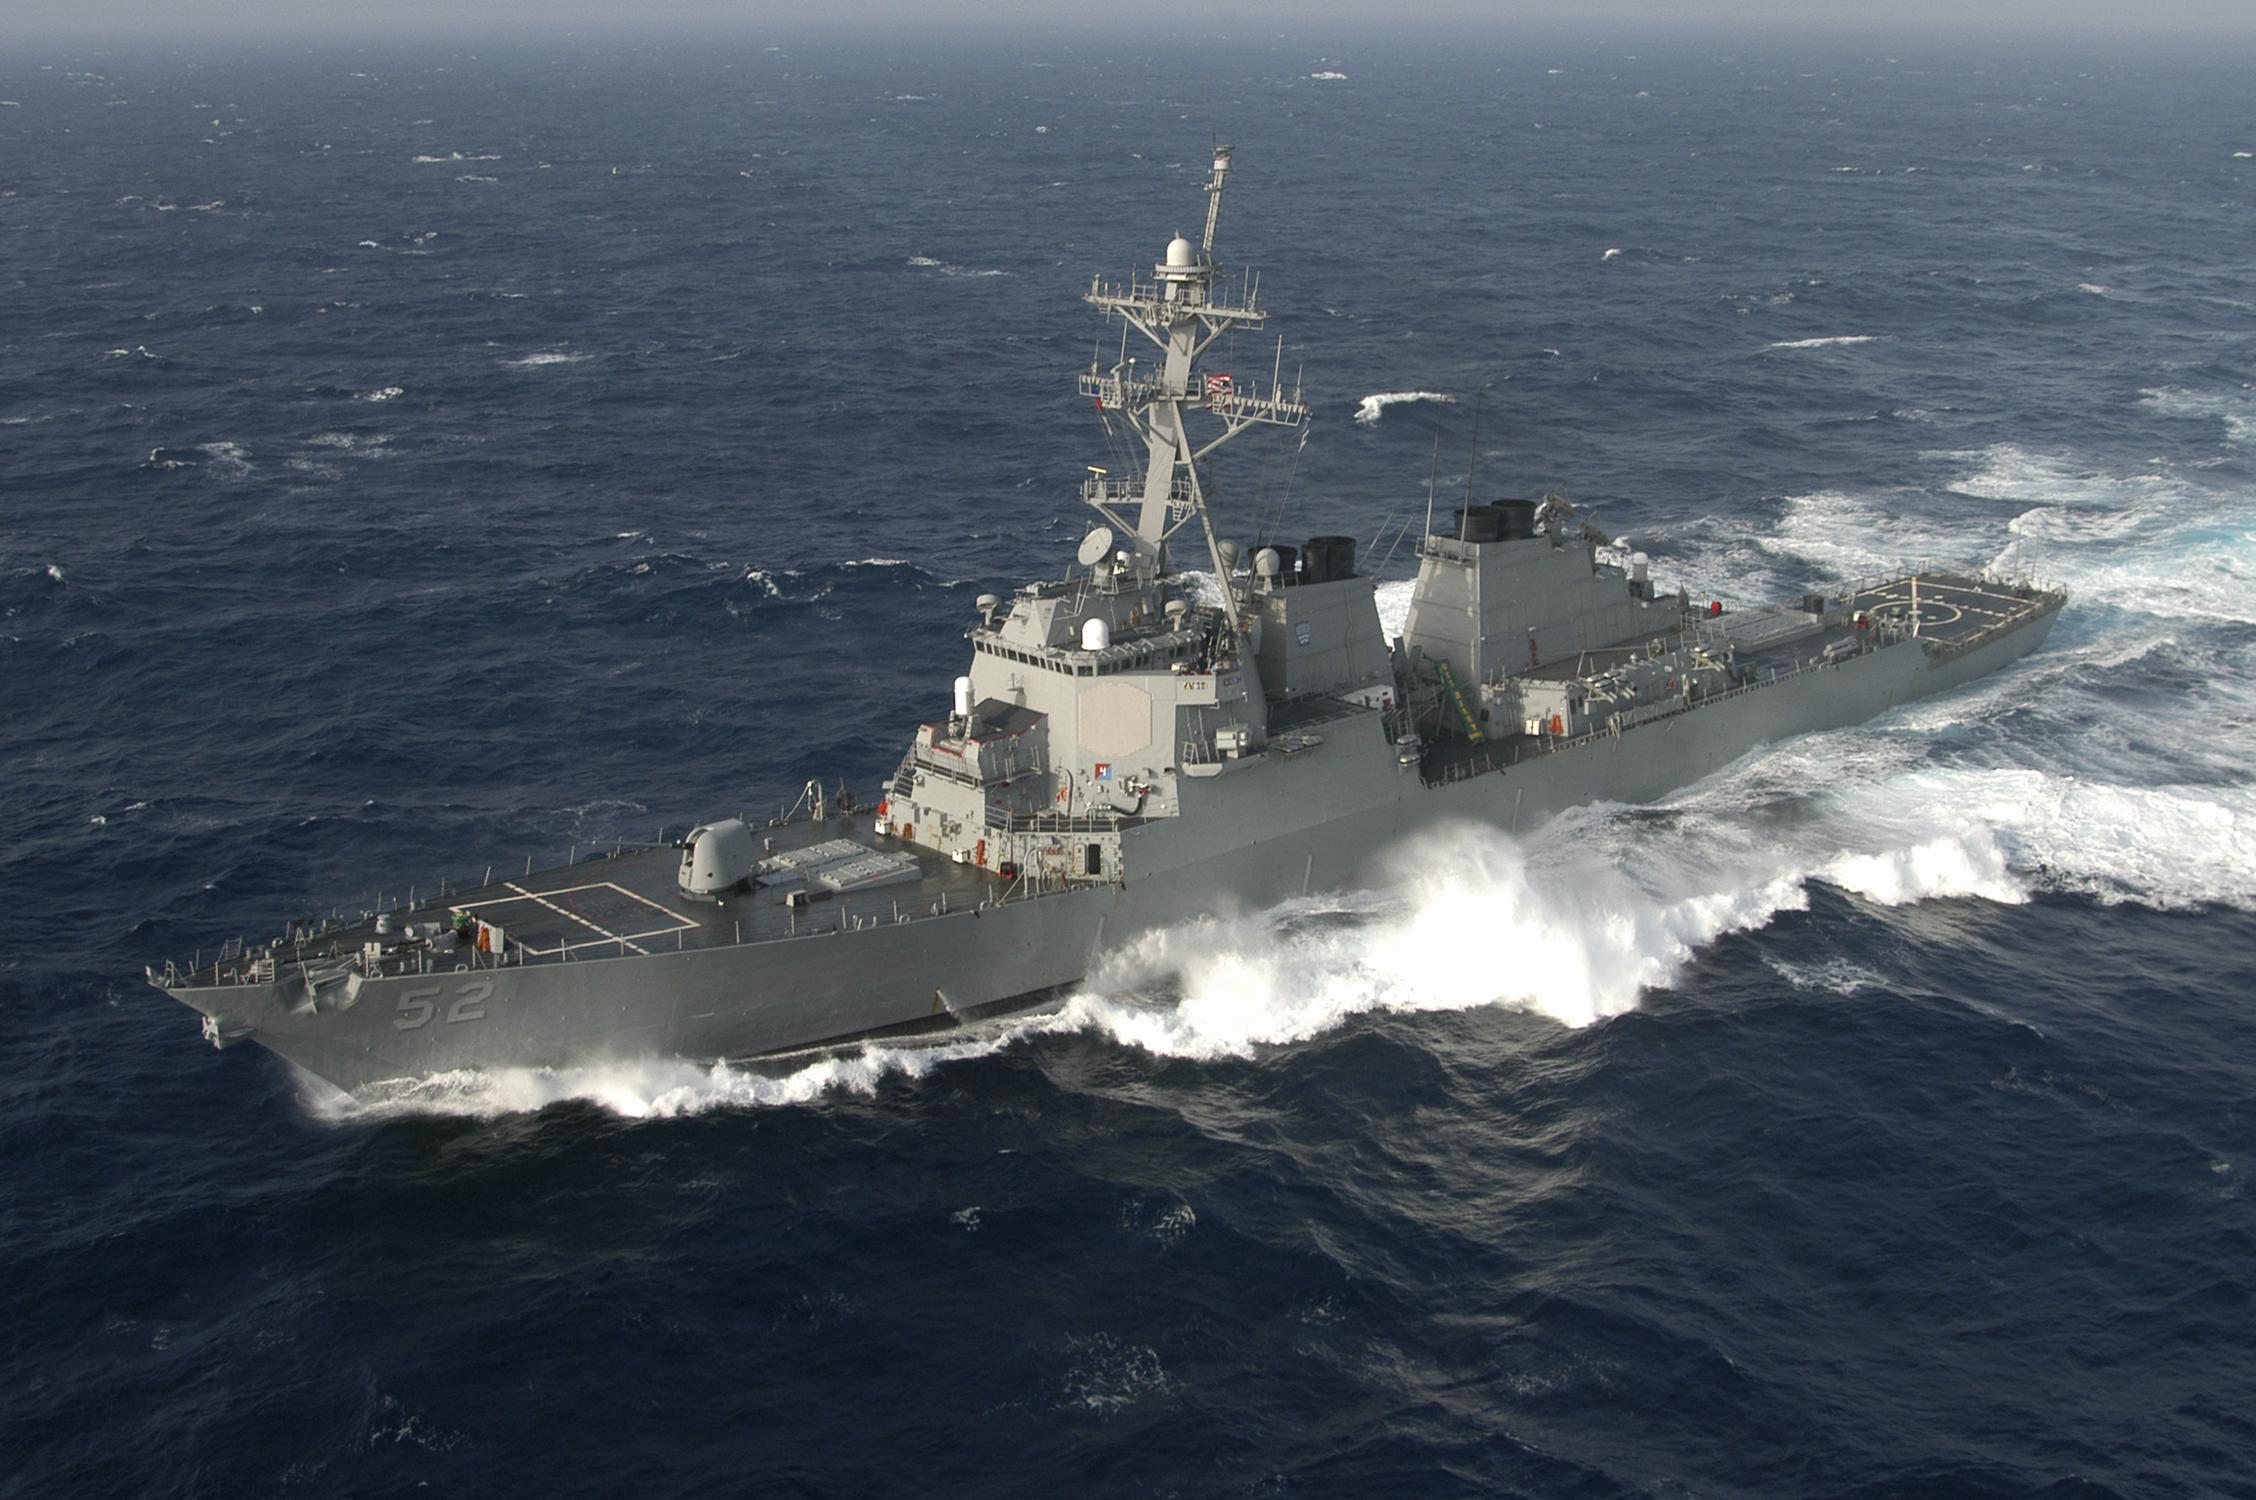 USS Barry (DDG-52) in the Atlantic Ocean